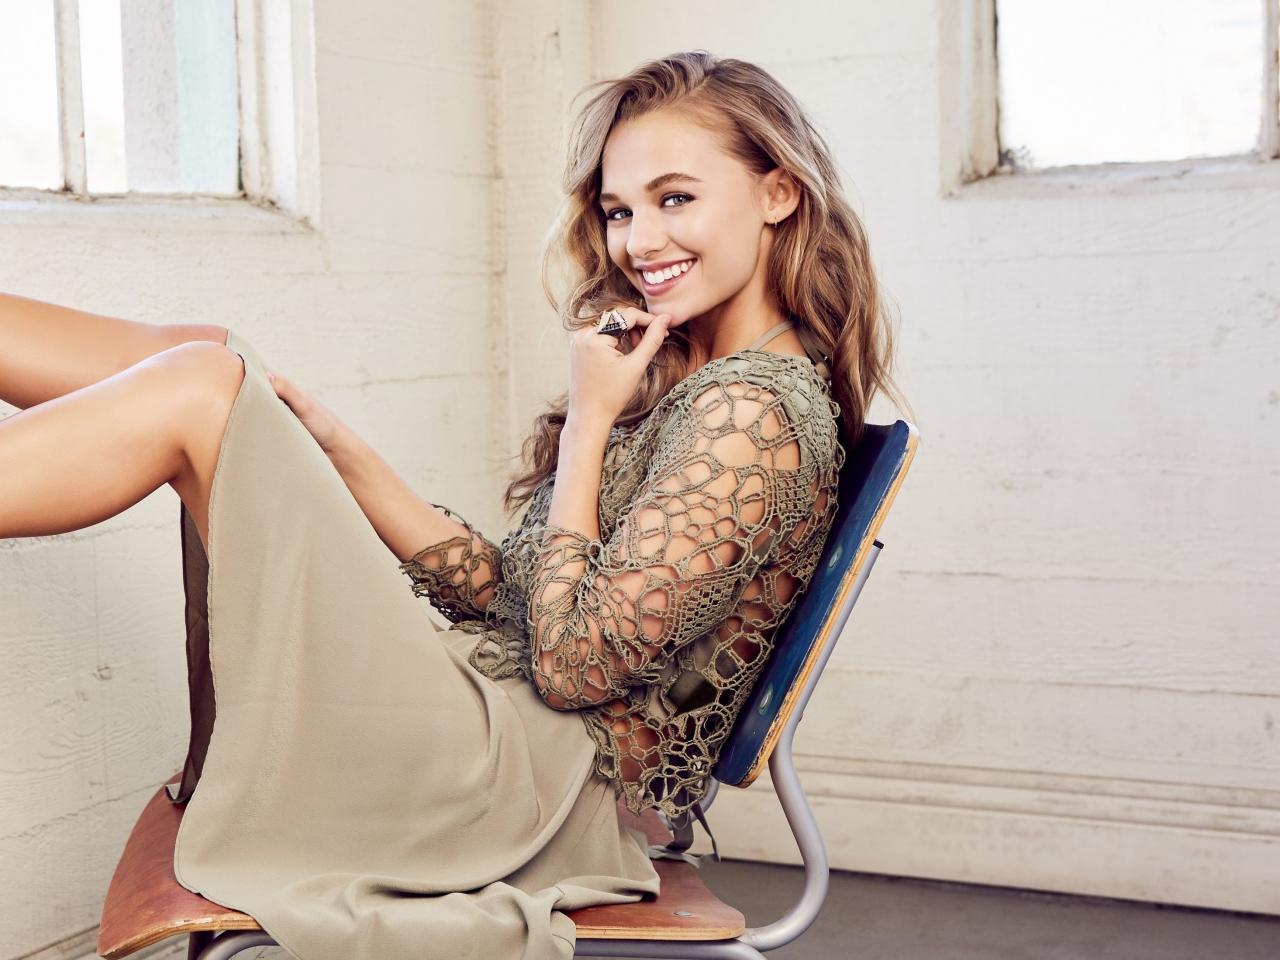 Madison Iseman, actress, smile, 2019, 1280x960 wallpaper